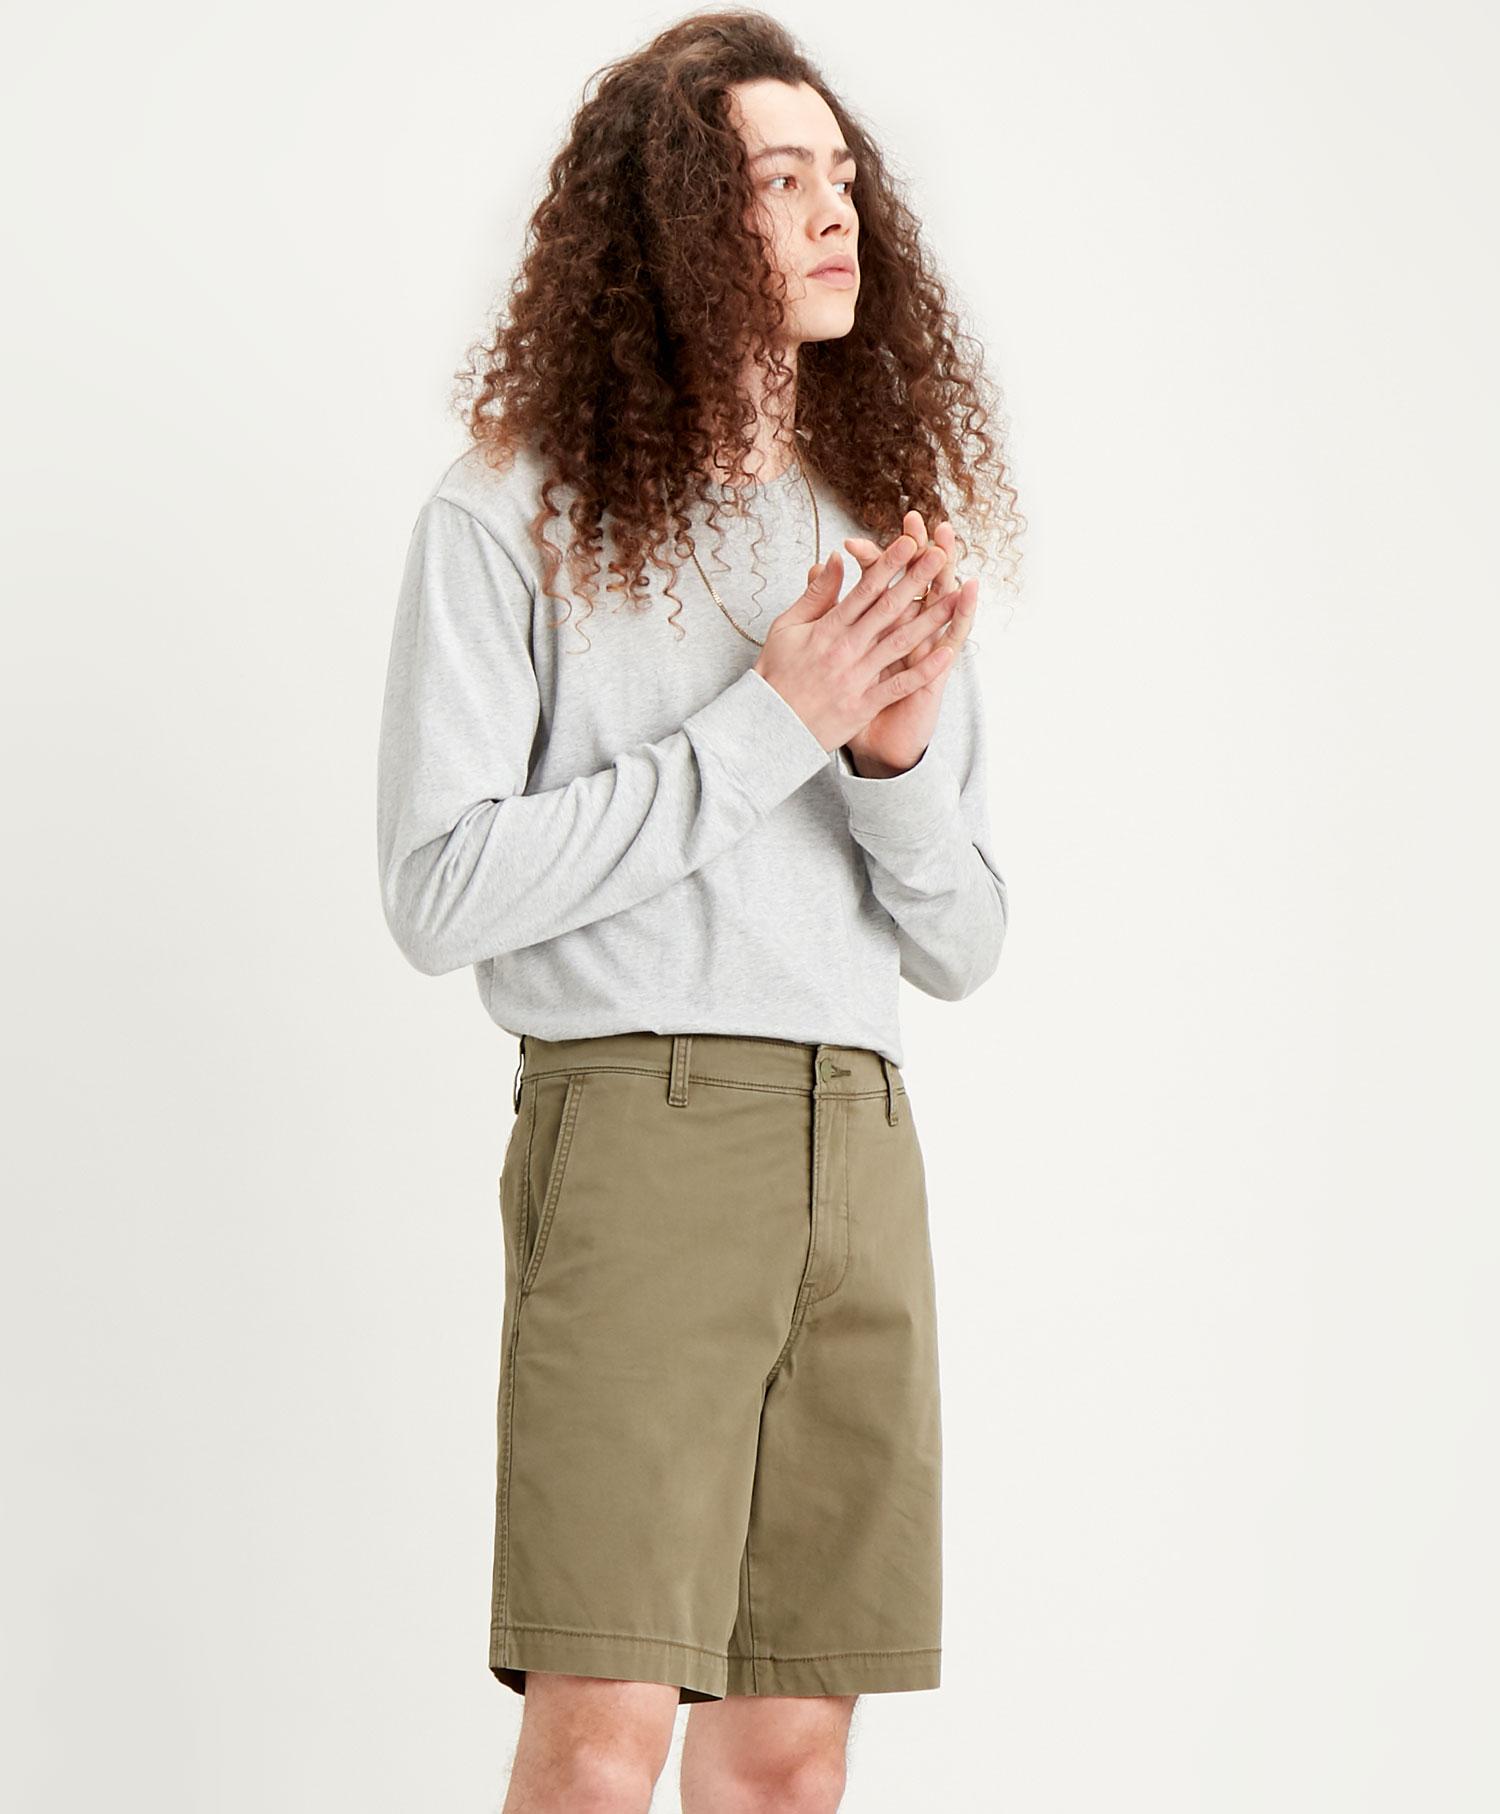 Levis Chinos  shorts